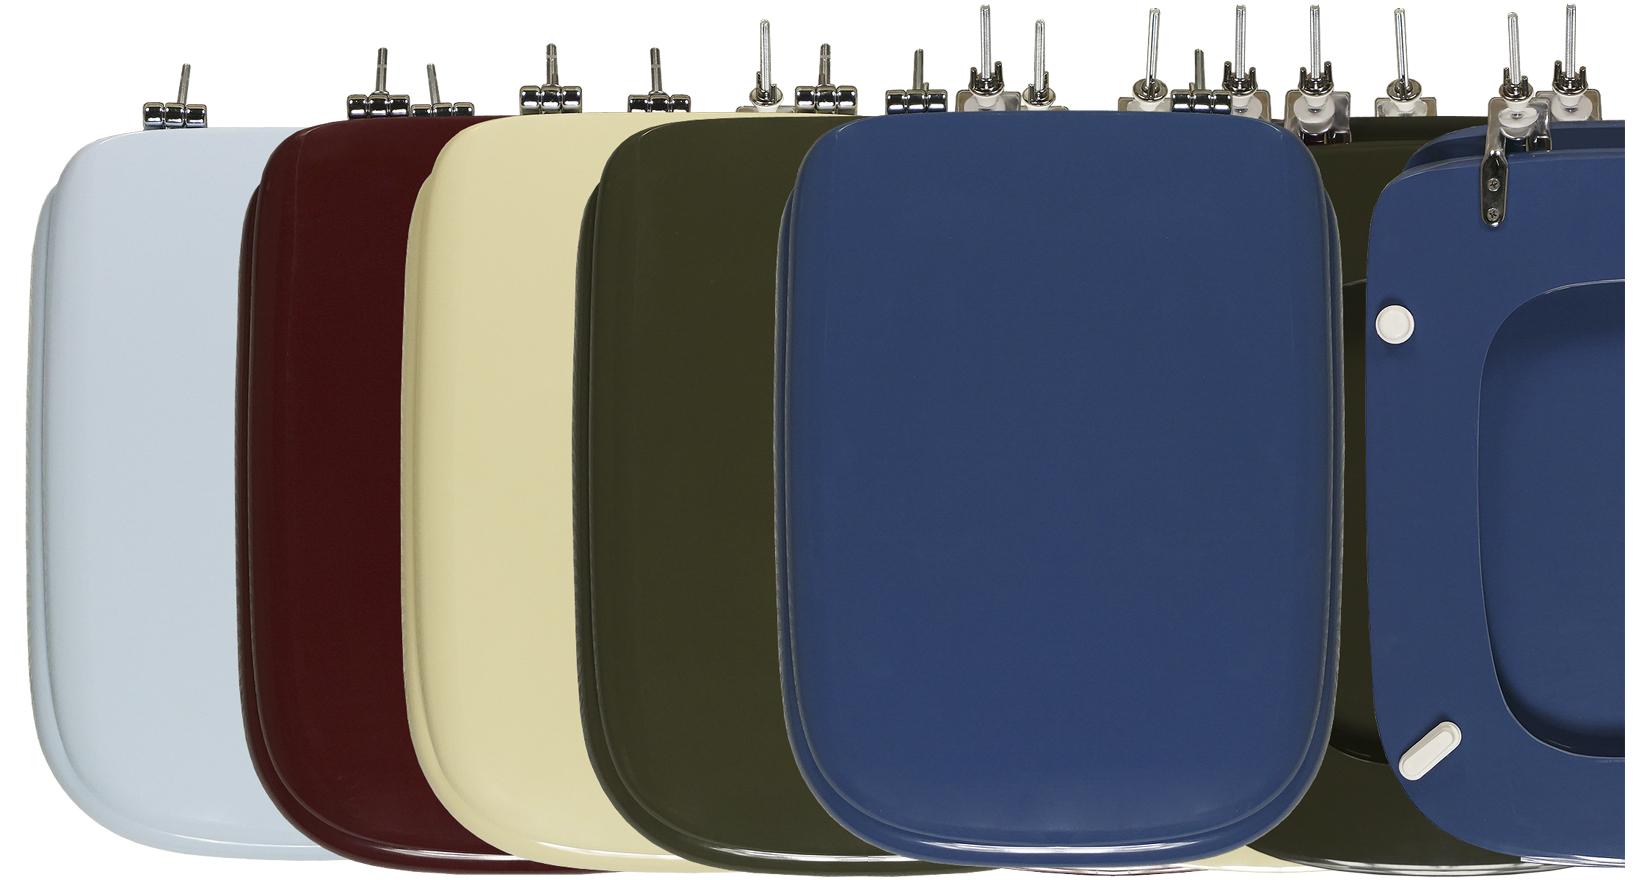 I copriwater conca colorati sintesibagnoblog for Modelli water ideal standard